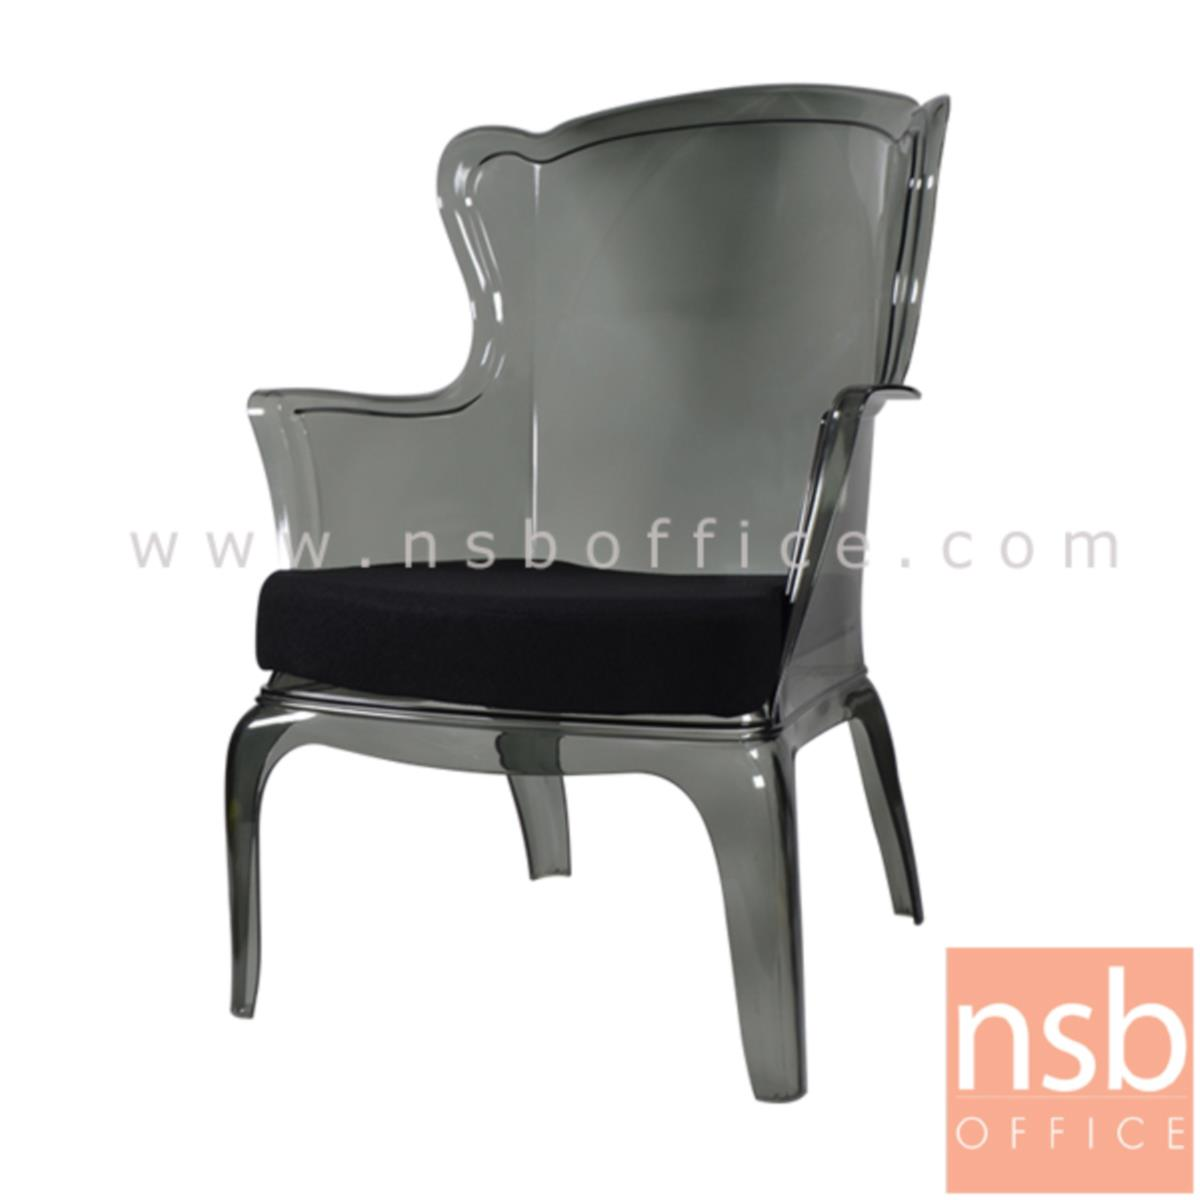 B29A042:เก้าอี้โมเดิร์นพลาสติก(PC) รุ่น PP92054-PC ขนาด 73W cm.